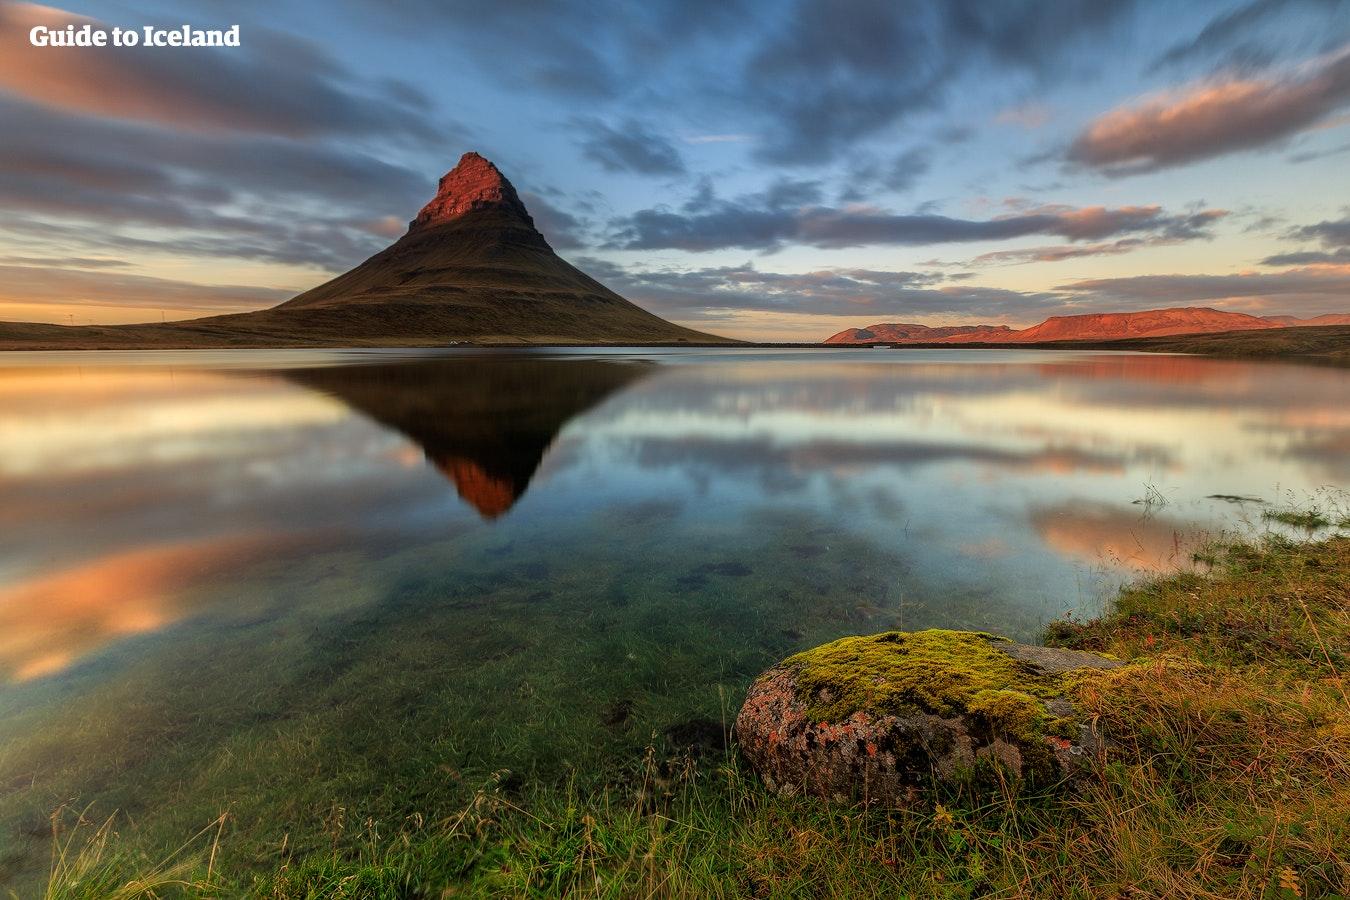 Kirkjufell, Iceland's most photographed mountain, can be found near the town of Grundarfjörður.